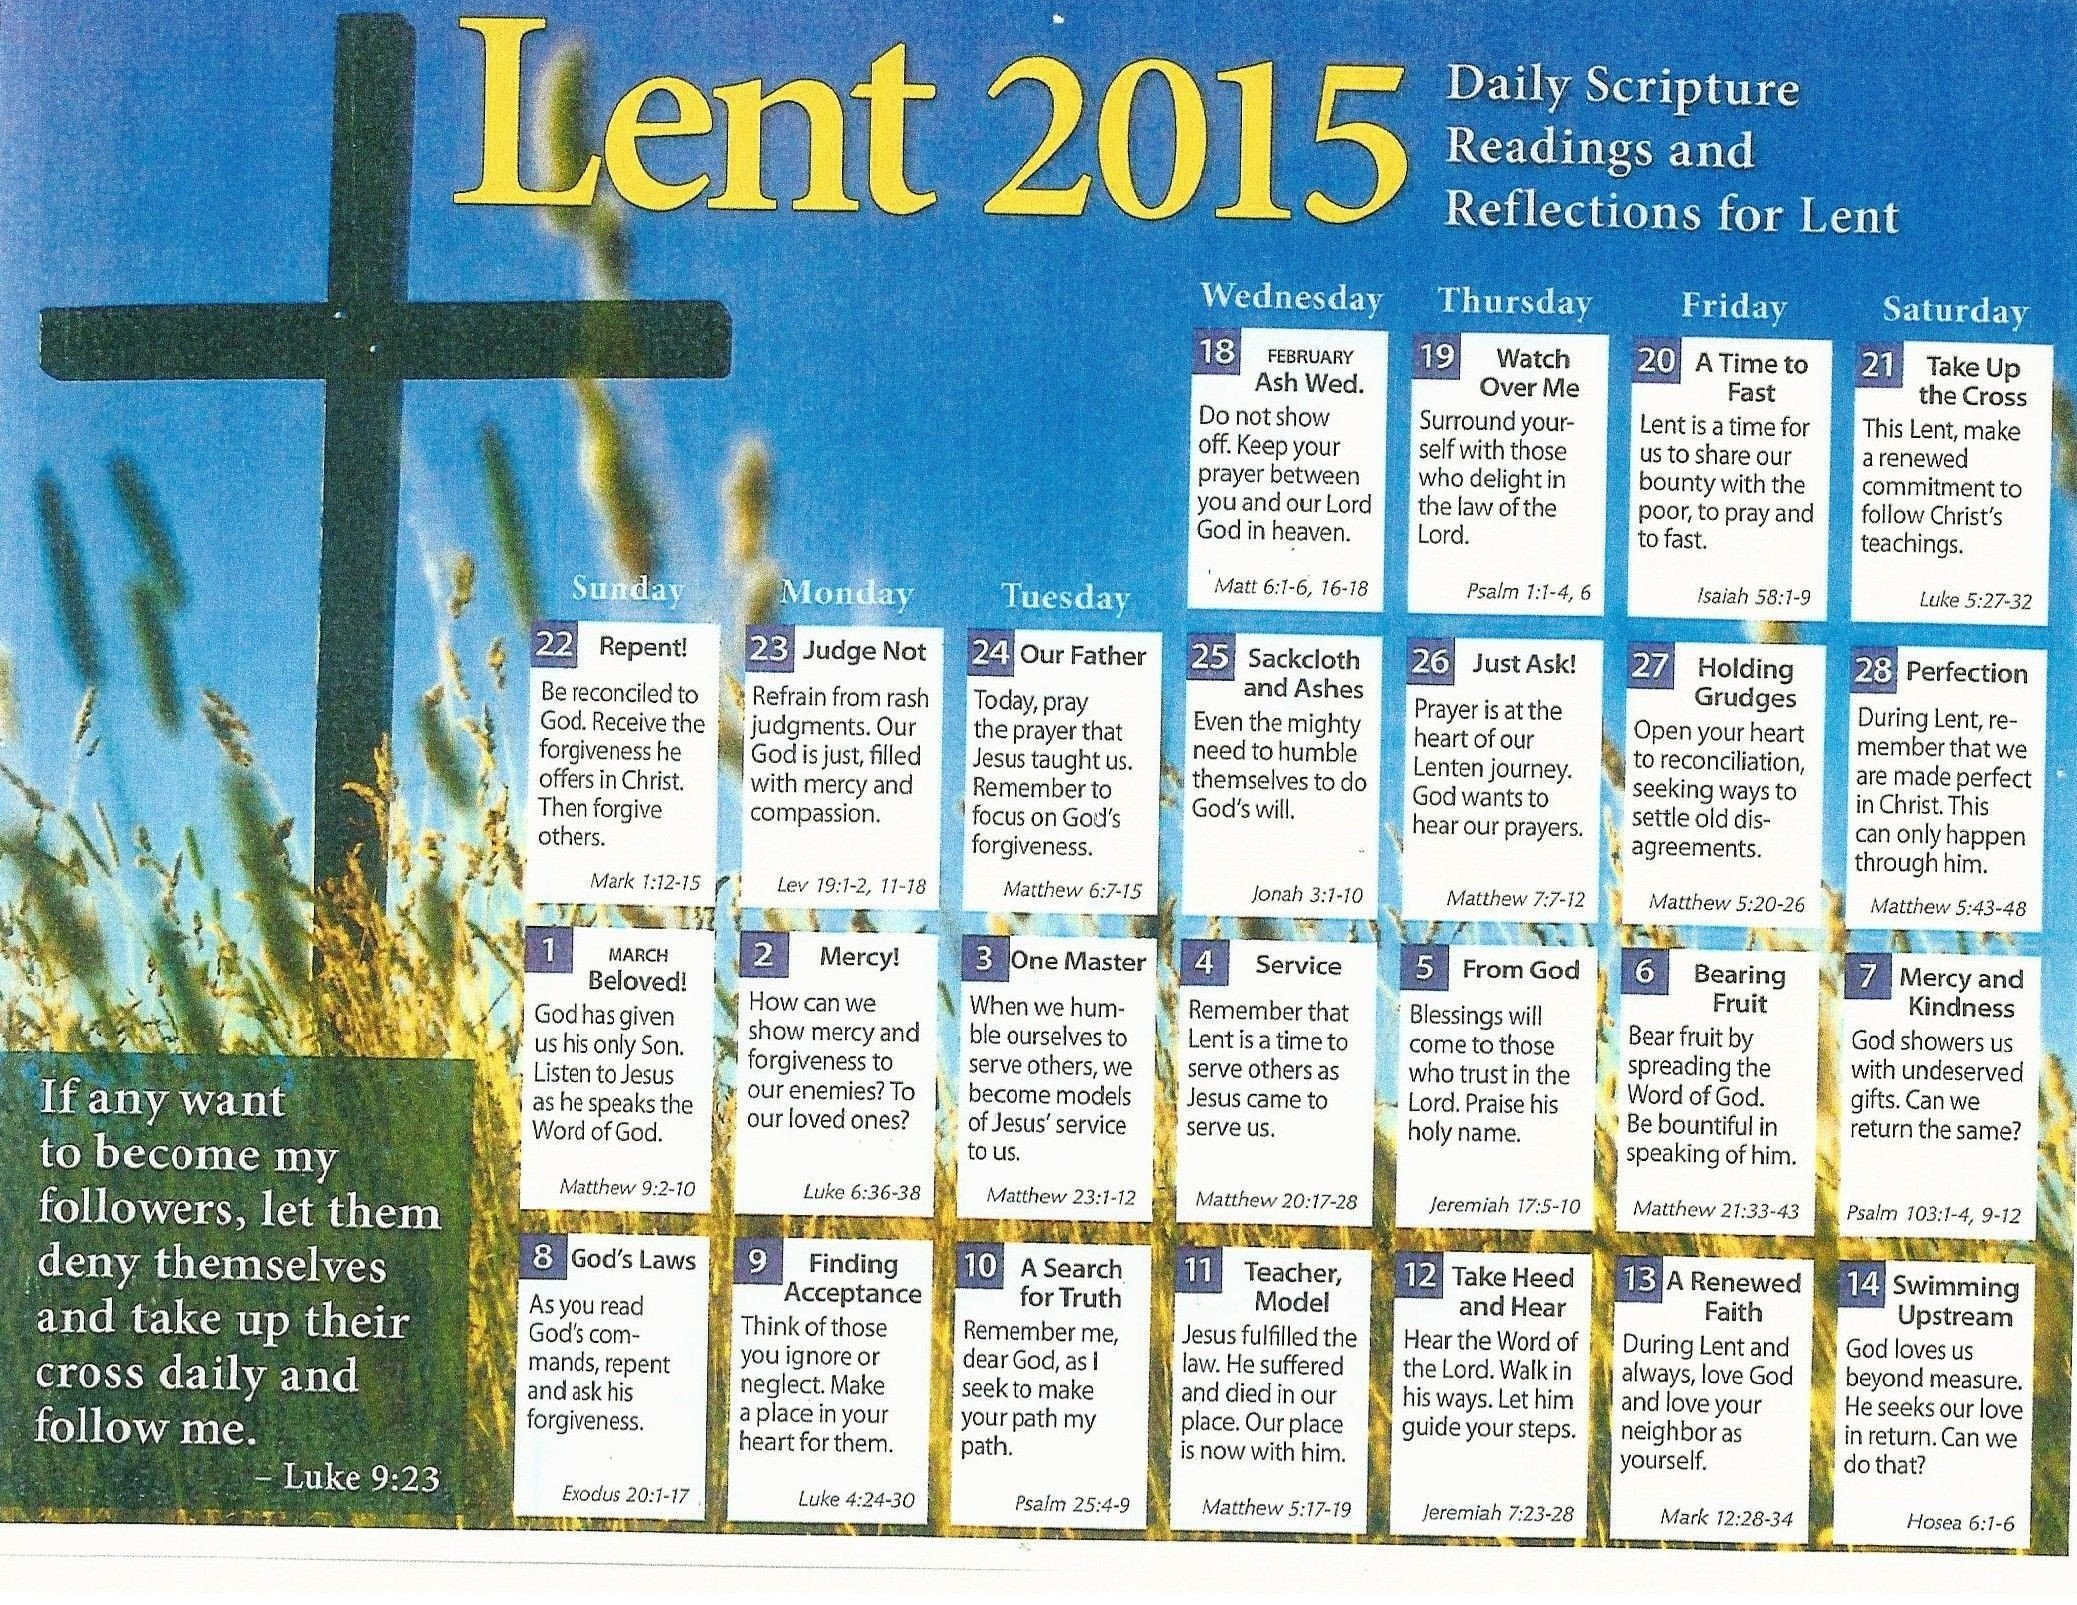 United Methodist Church Liturgical Calendar – Template Liturgical Colors Calendar For Methodist